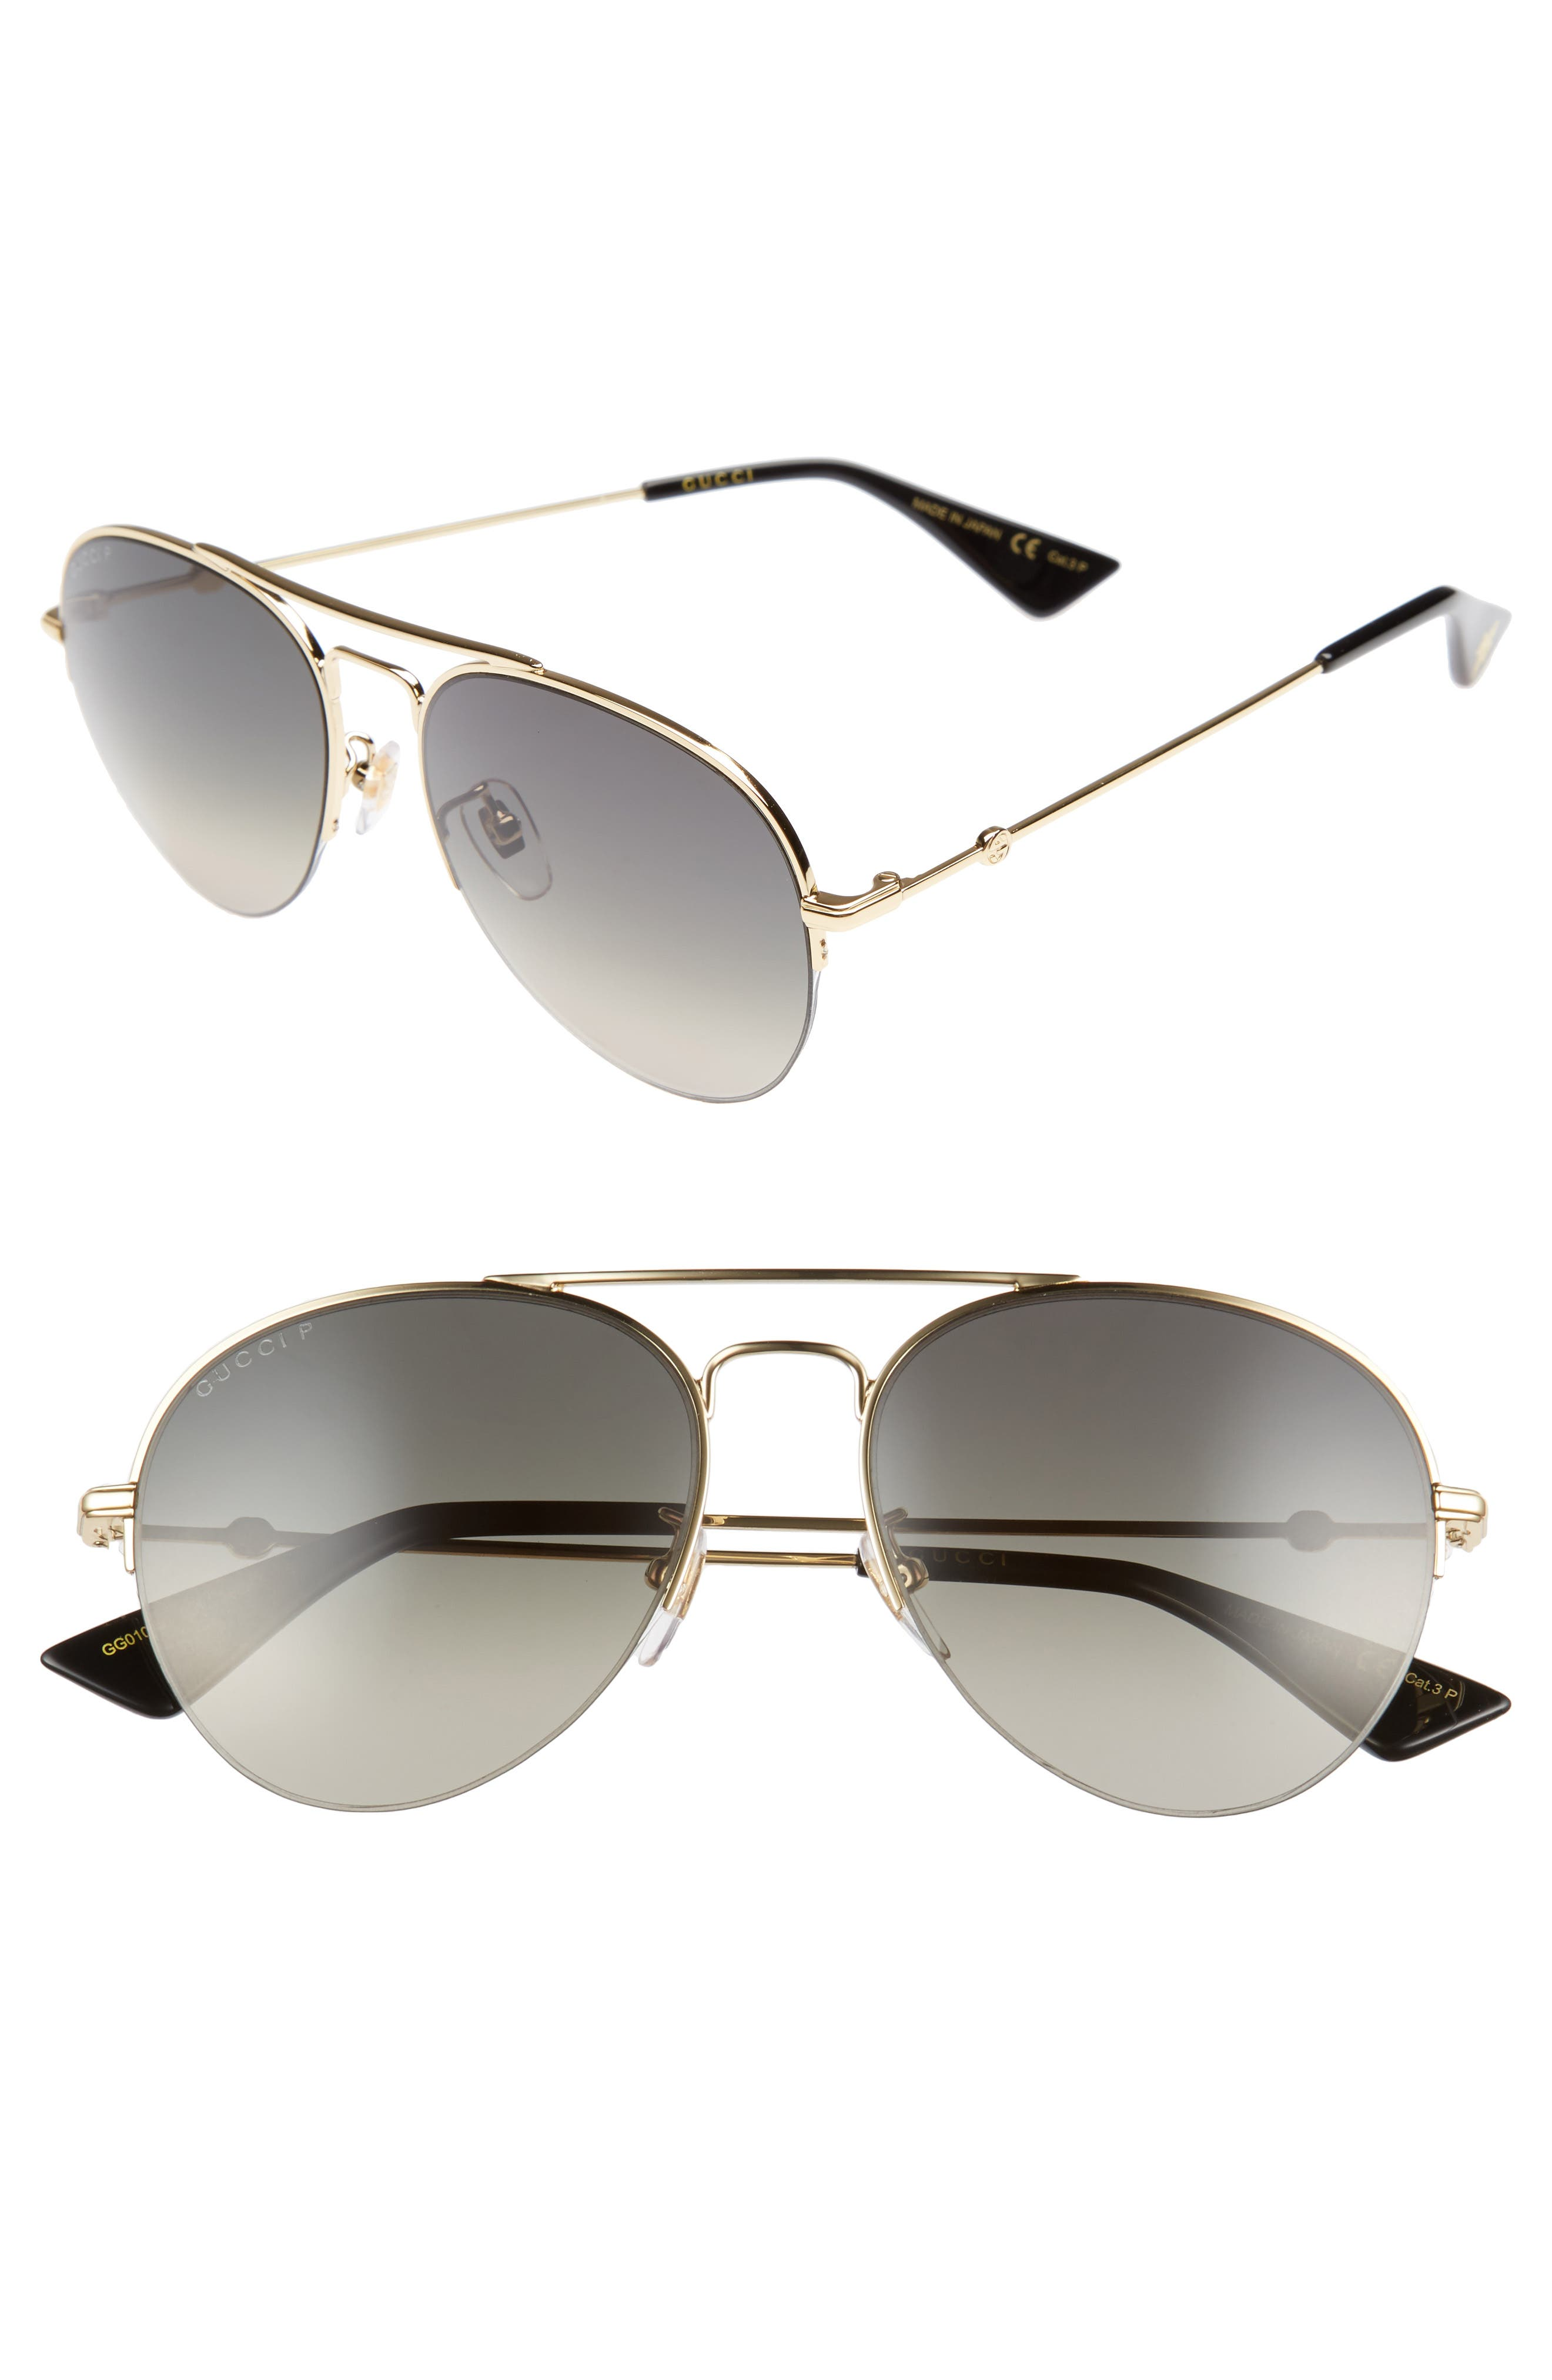 Pilot 56mm Aviator Sunglasses,                             Main thumbnail 1, color,                             GOLD